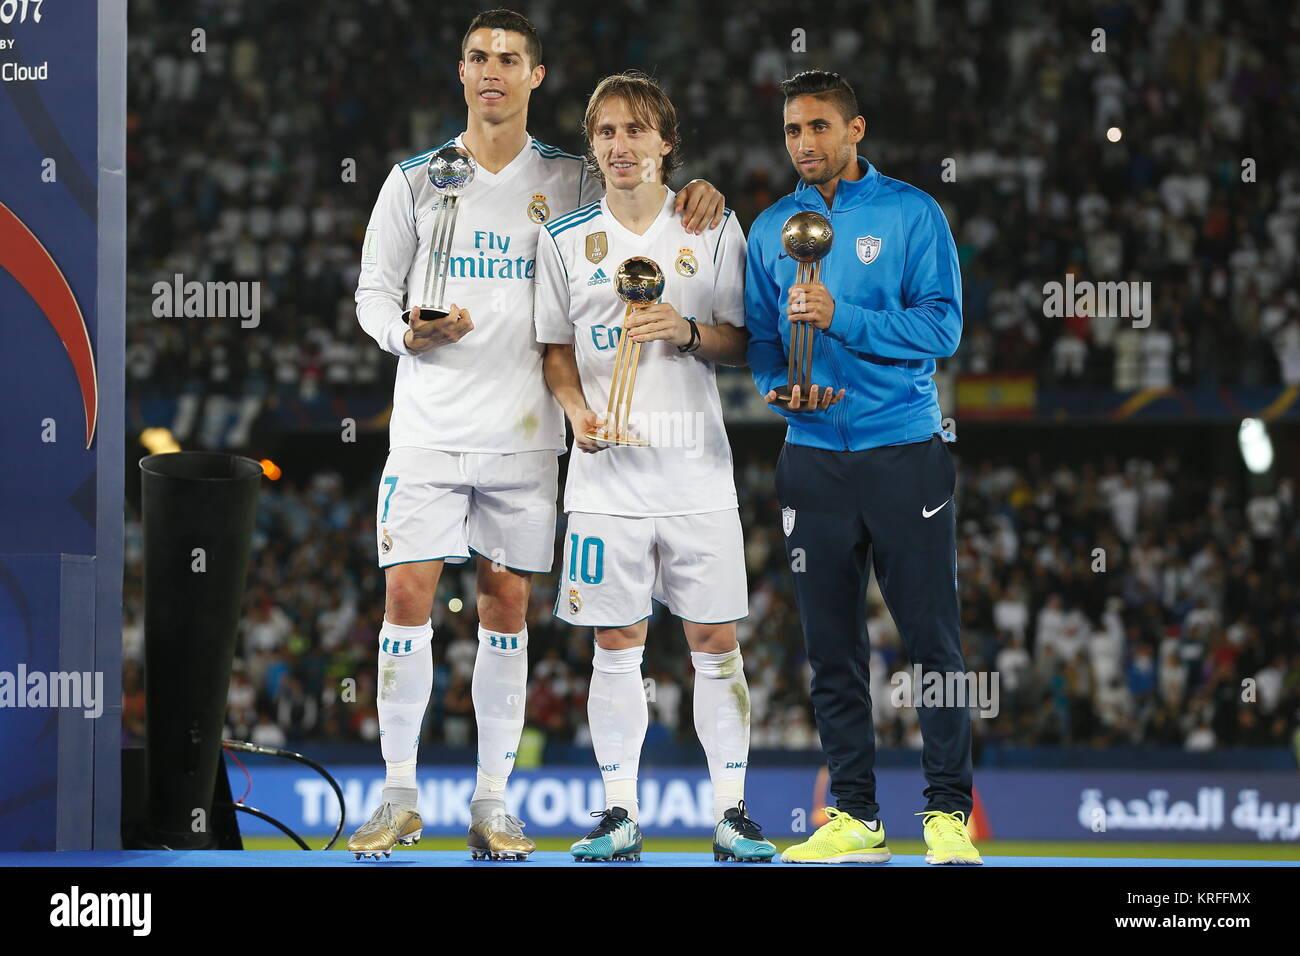 premium selection ace95 61cc1 Abu Dhabi, UAE. 16th Dec, 2017. (L-R) Cristiano Ronaldo ...